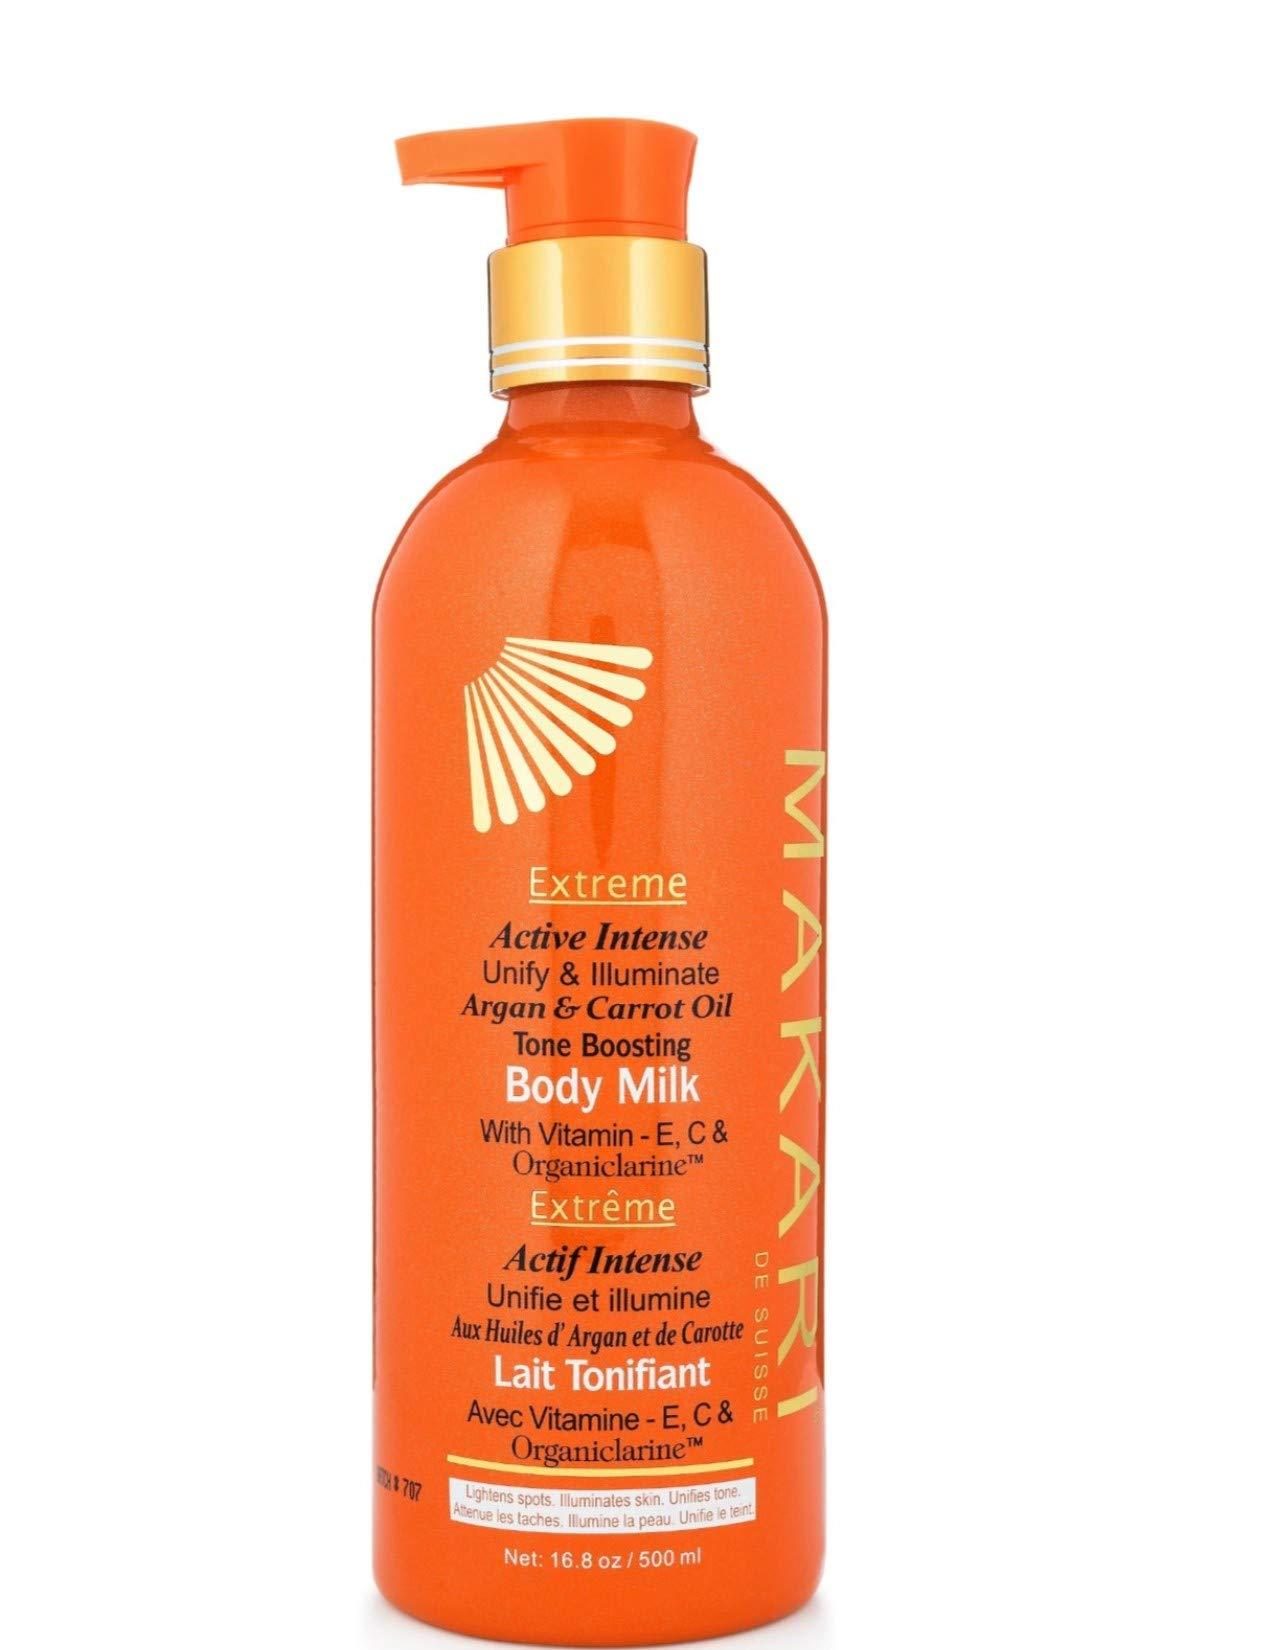 Makari Extreme Carrot & Argan Oil Skin Toning BODY MILK 16.8oz – Lightening, Brightening & Tightening Body Lotion with Organiclarine – Whitening & Anti-Aging Treatment for Dark Spots, Acne